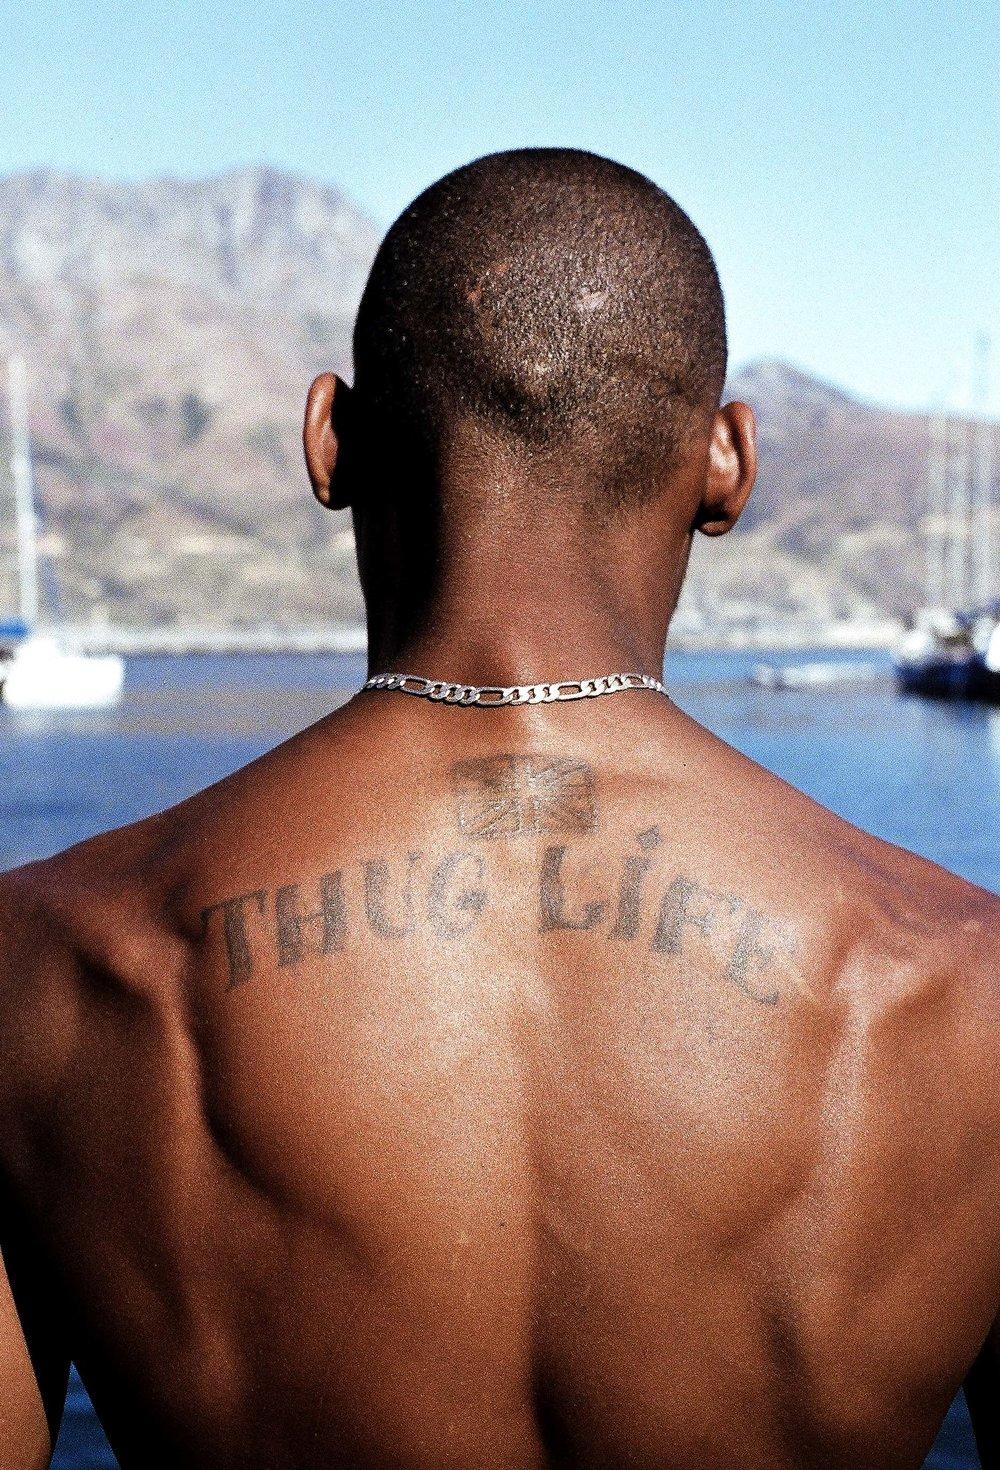 ThugLife.jpg